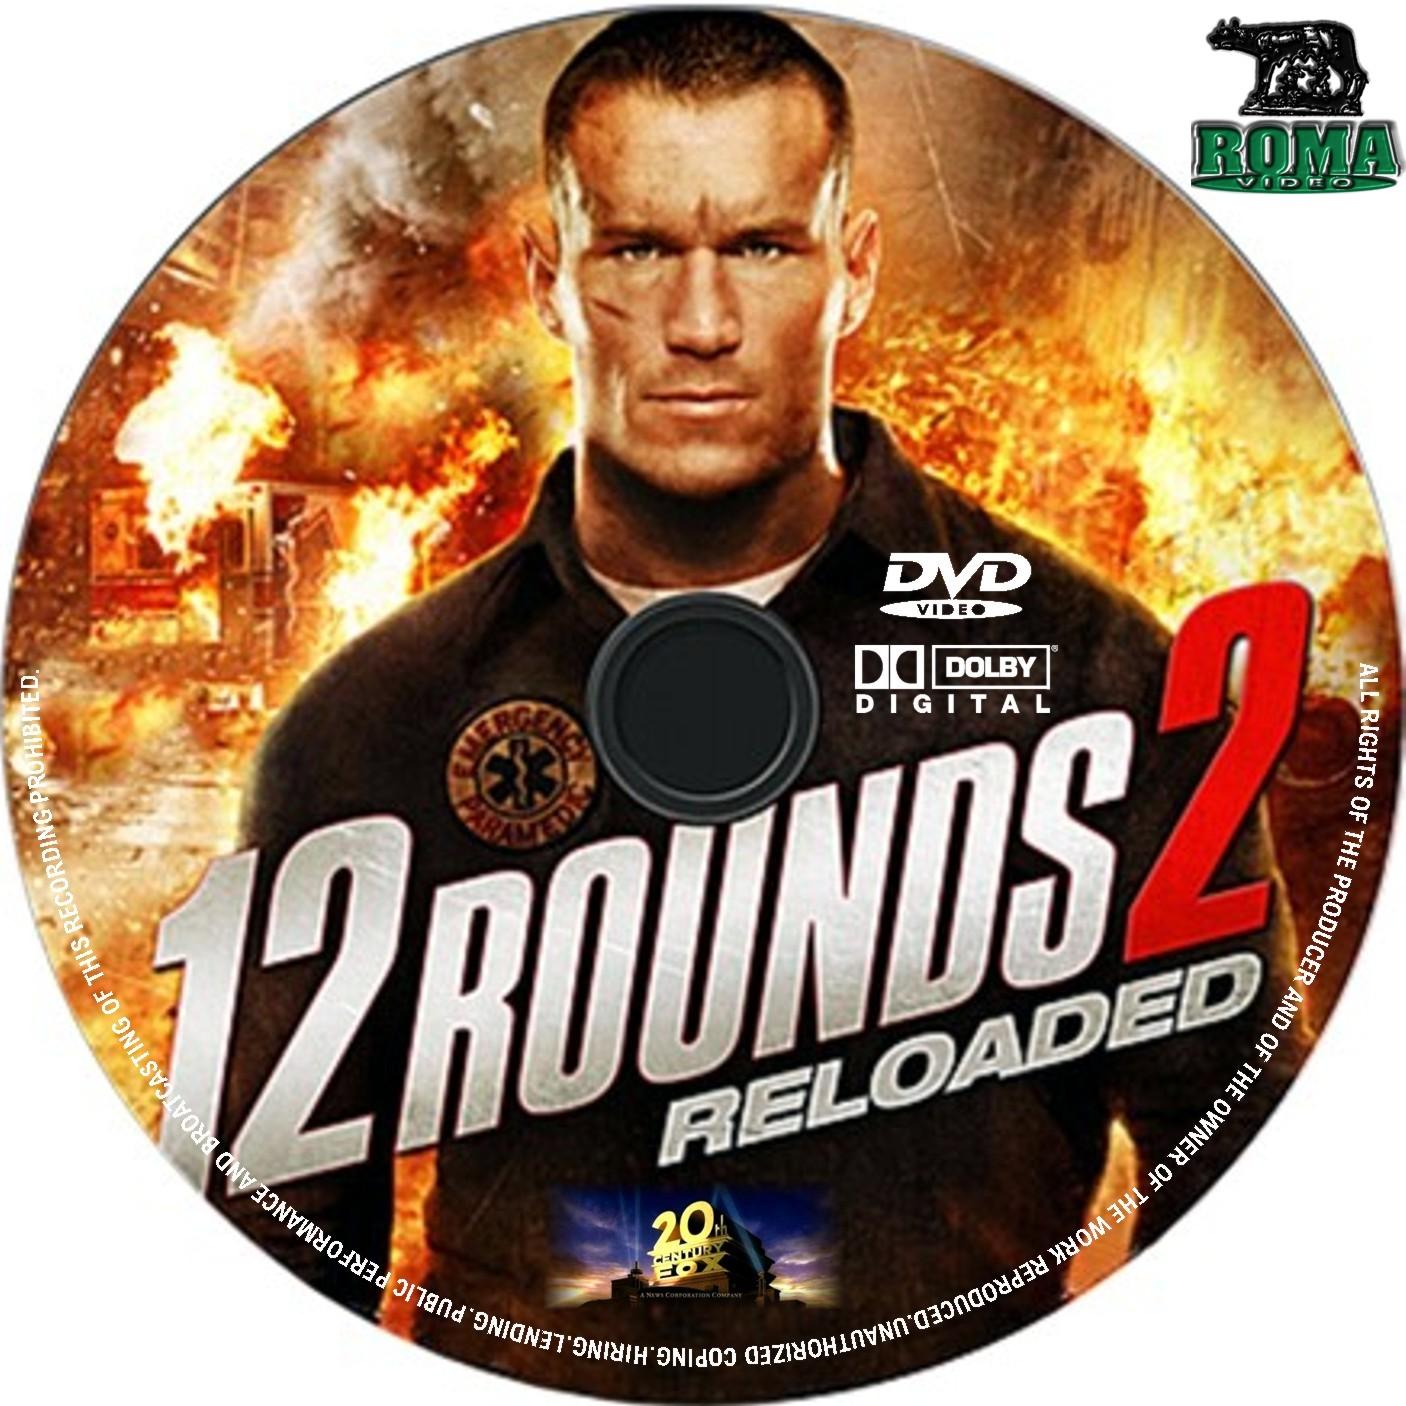 Rounds  Reloaded Full Movie